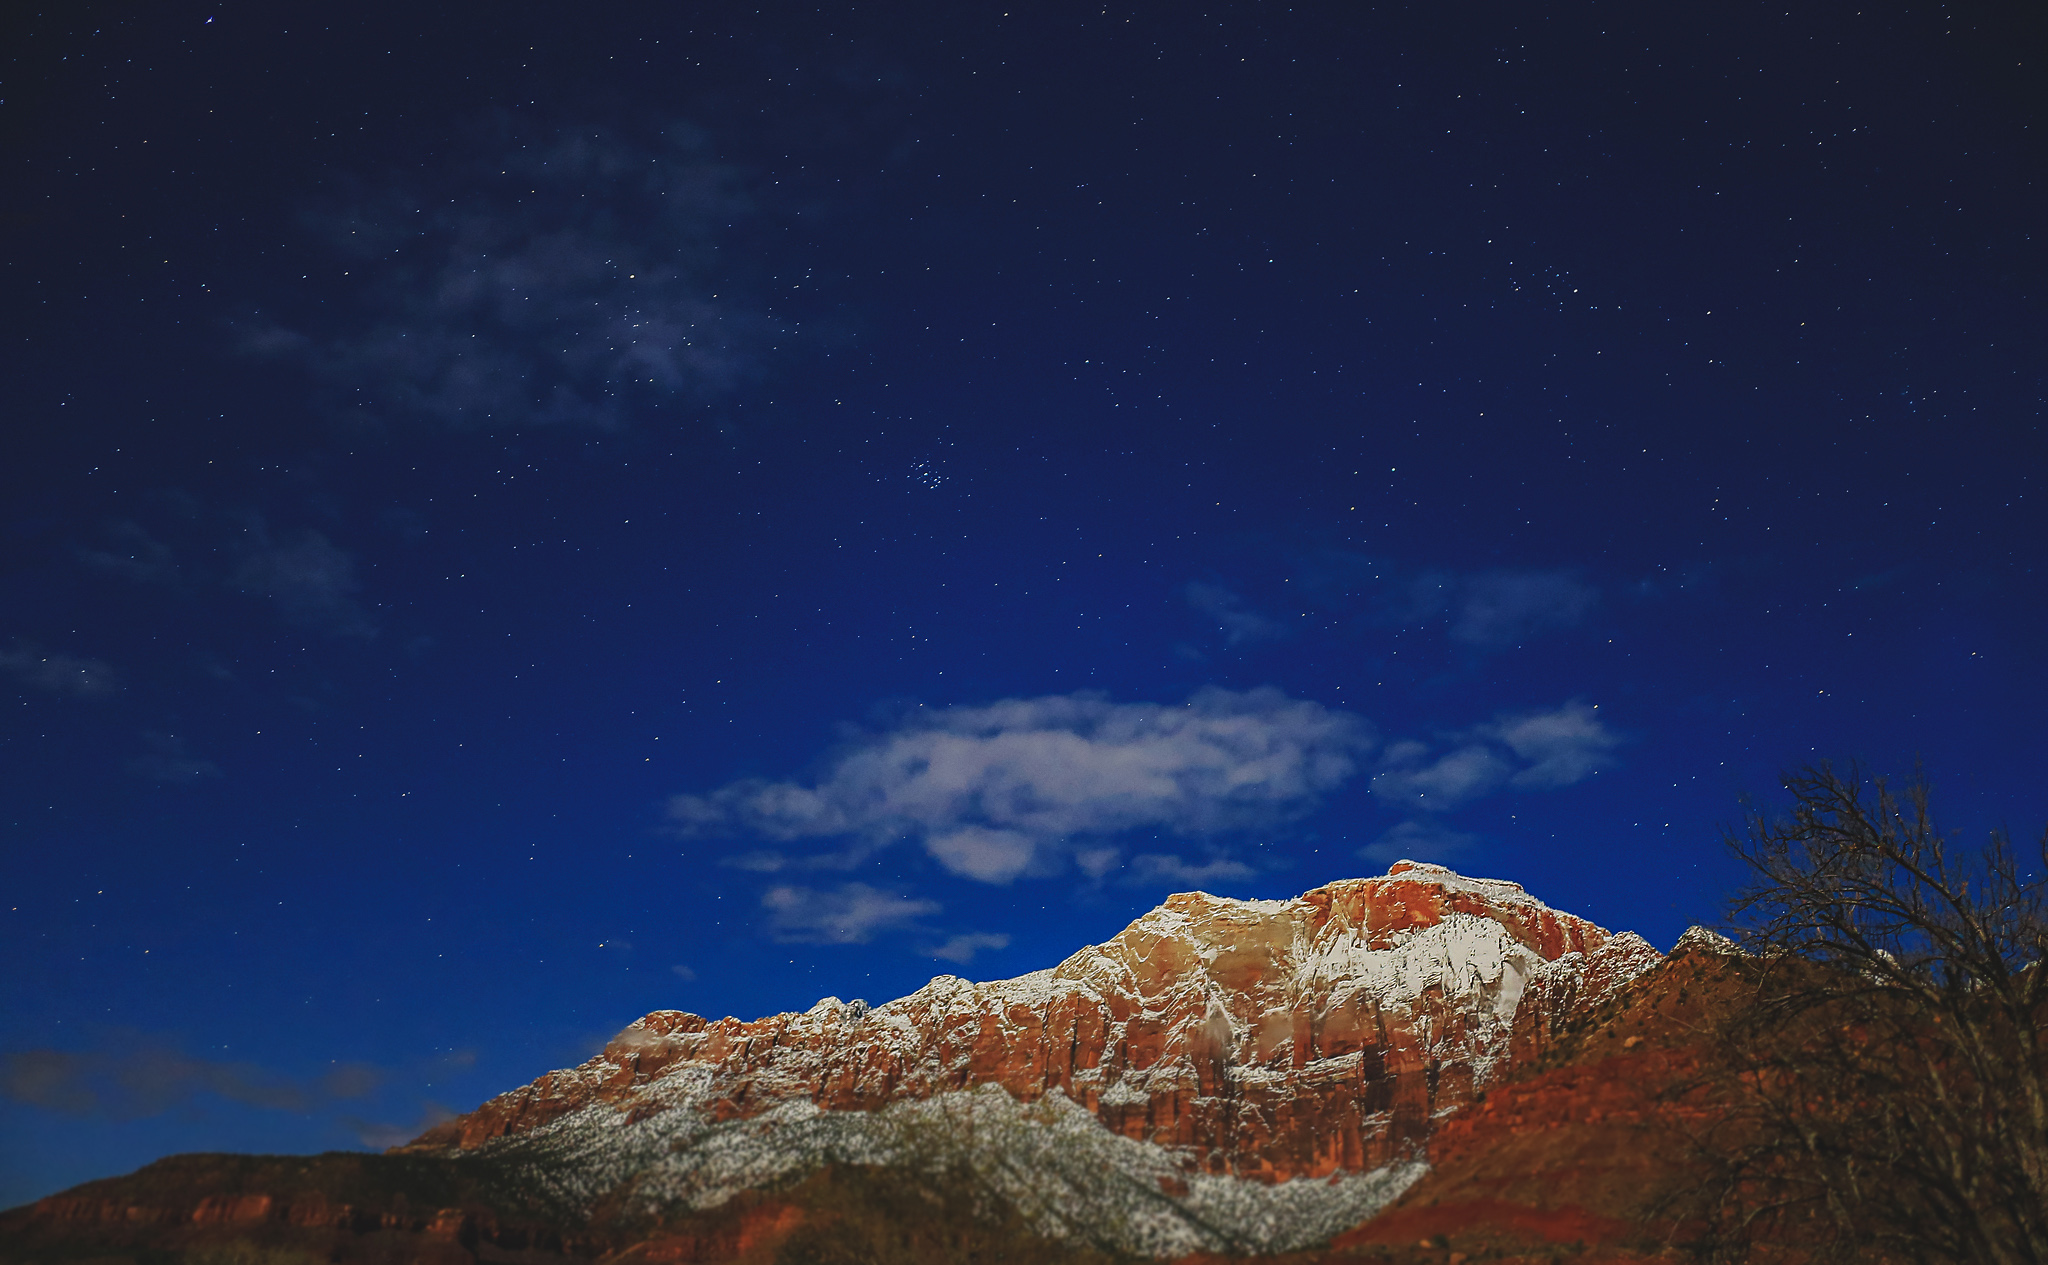 IMG_7792-ZION-STARS-JENNIFER-PICARD-PHOTOGRAPHY-WEB.jpg